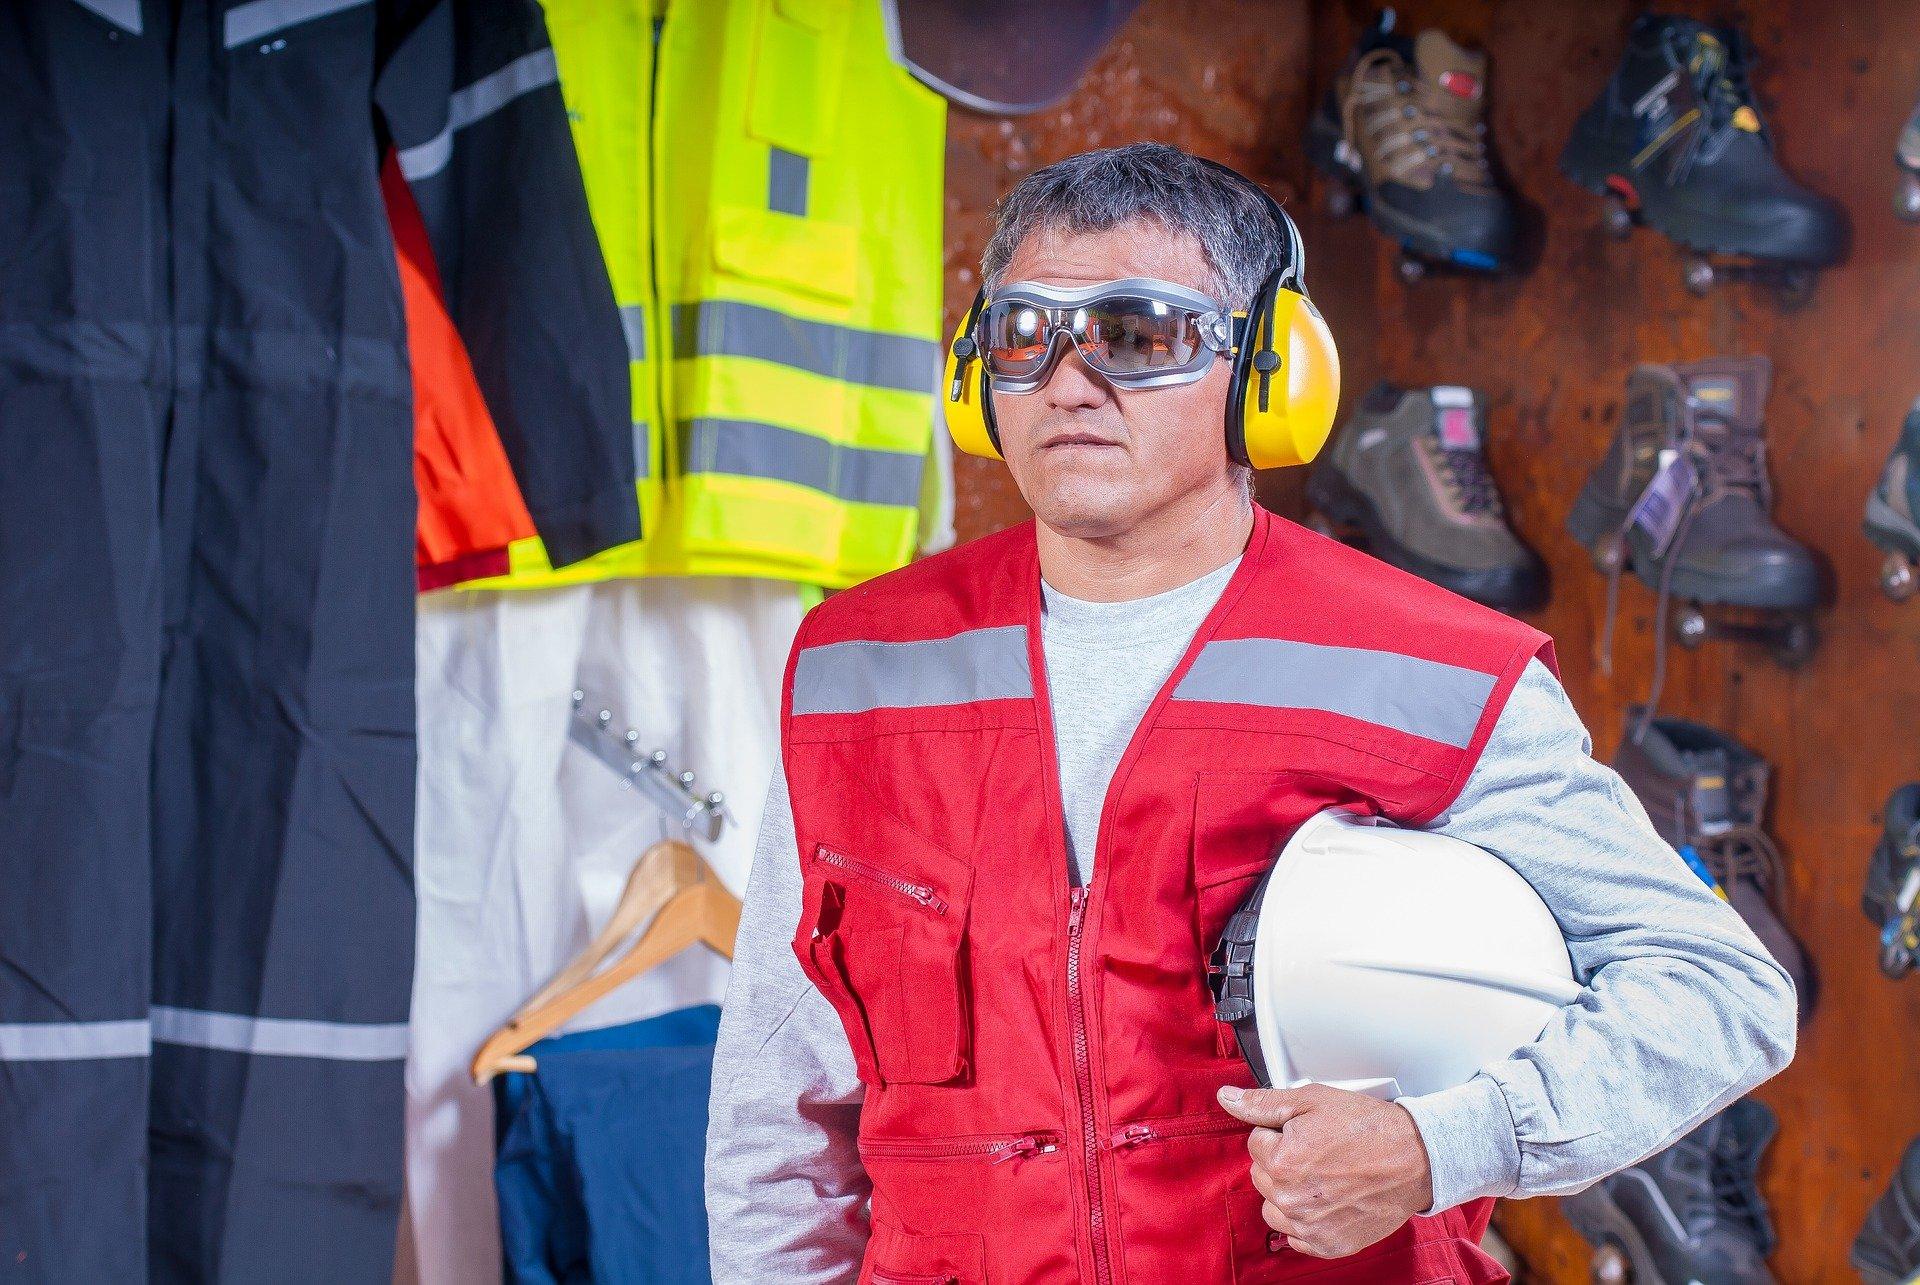 Training for safety supervisors